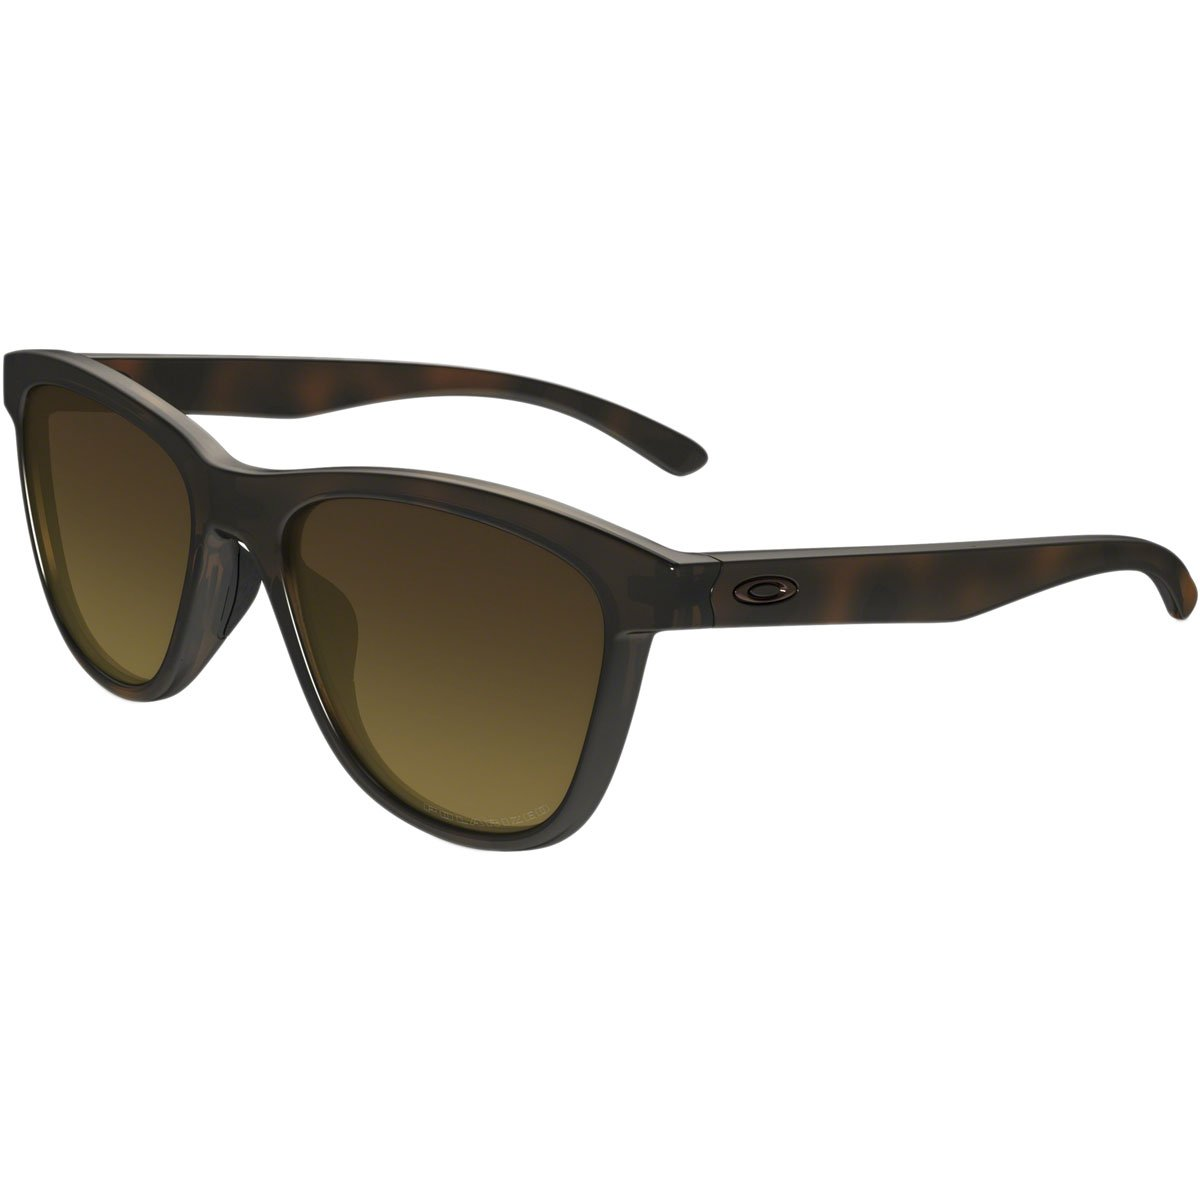 Oakley Men's Moonlighter Polarized Round Sunglasses, Tortoise w/Brown Gradient Polarized, 53 mm